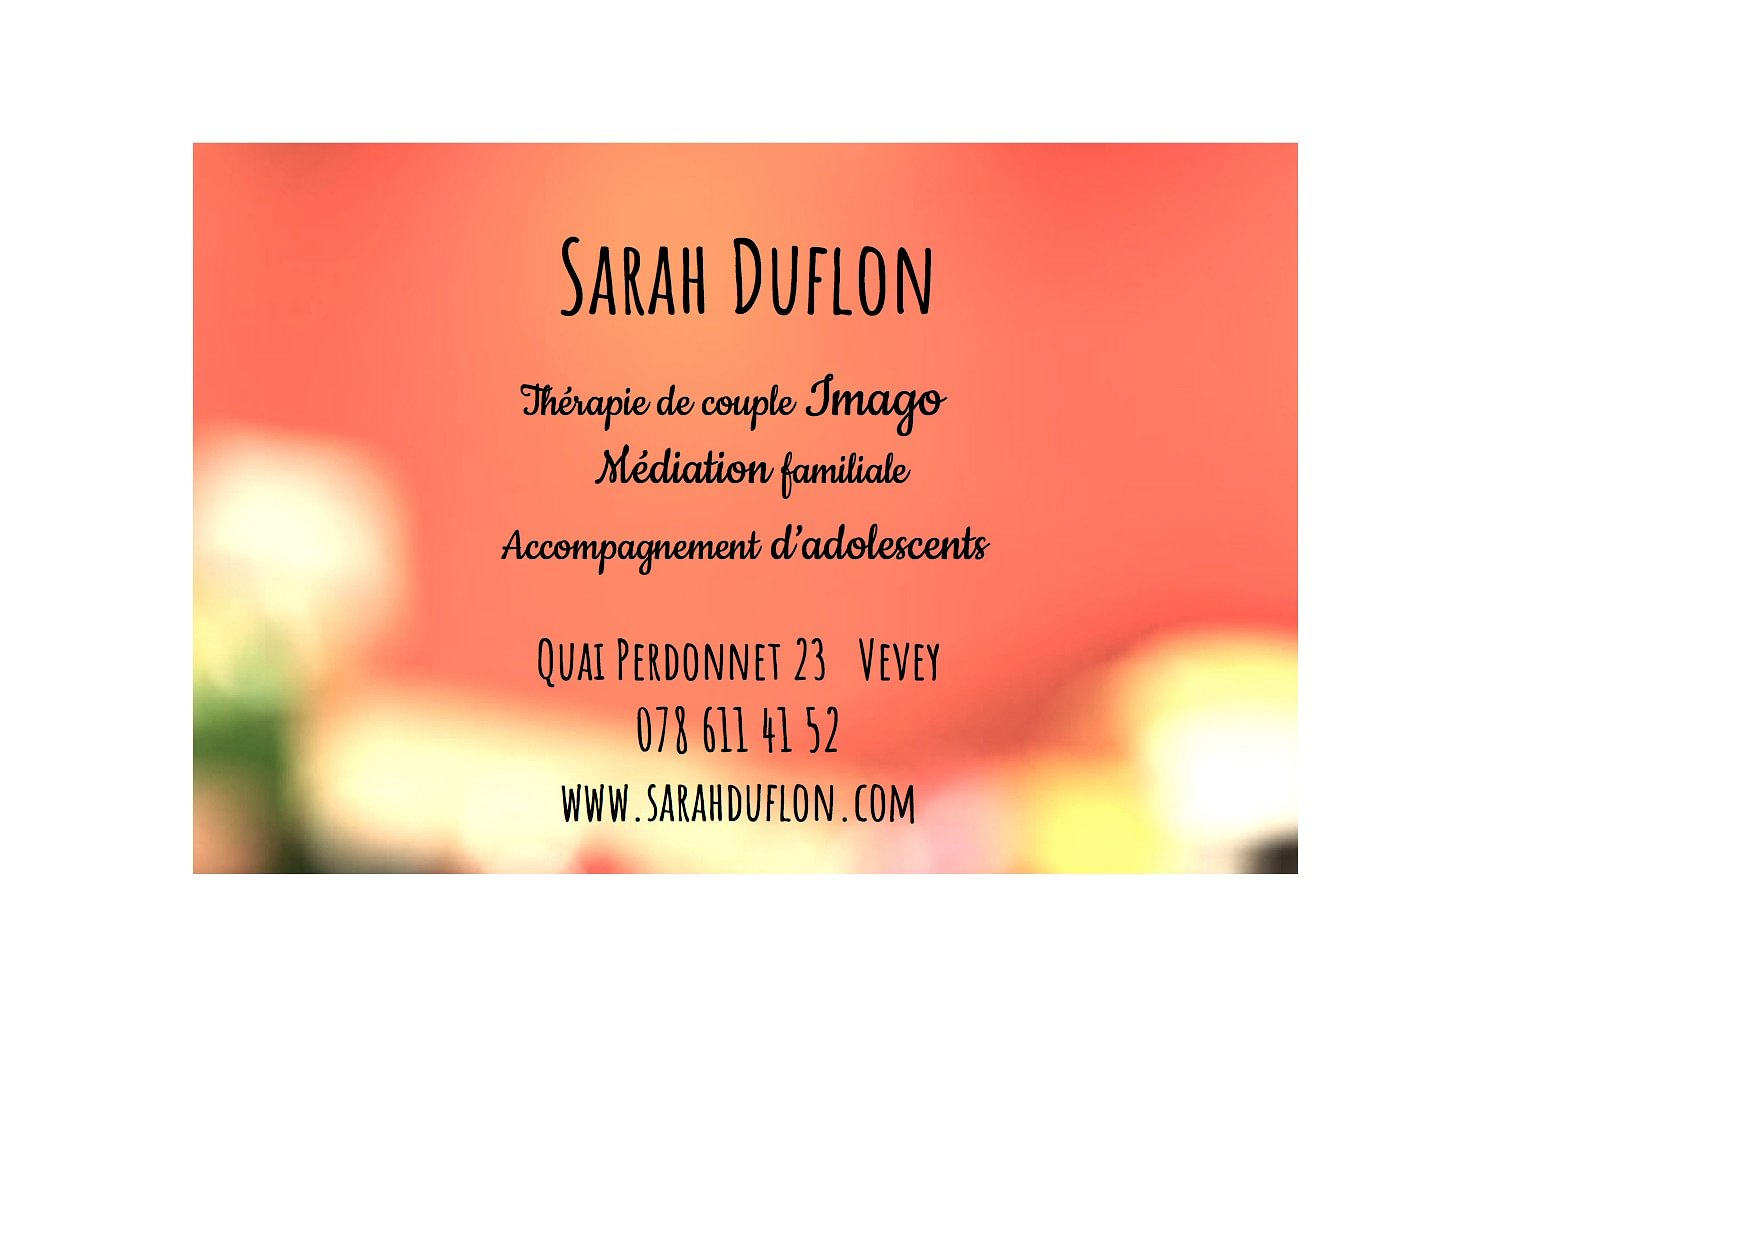 Duflon Sarah Vevey